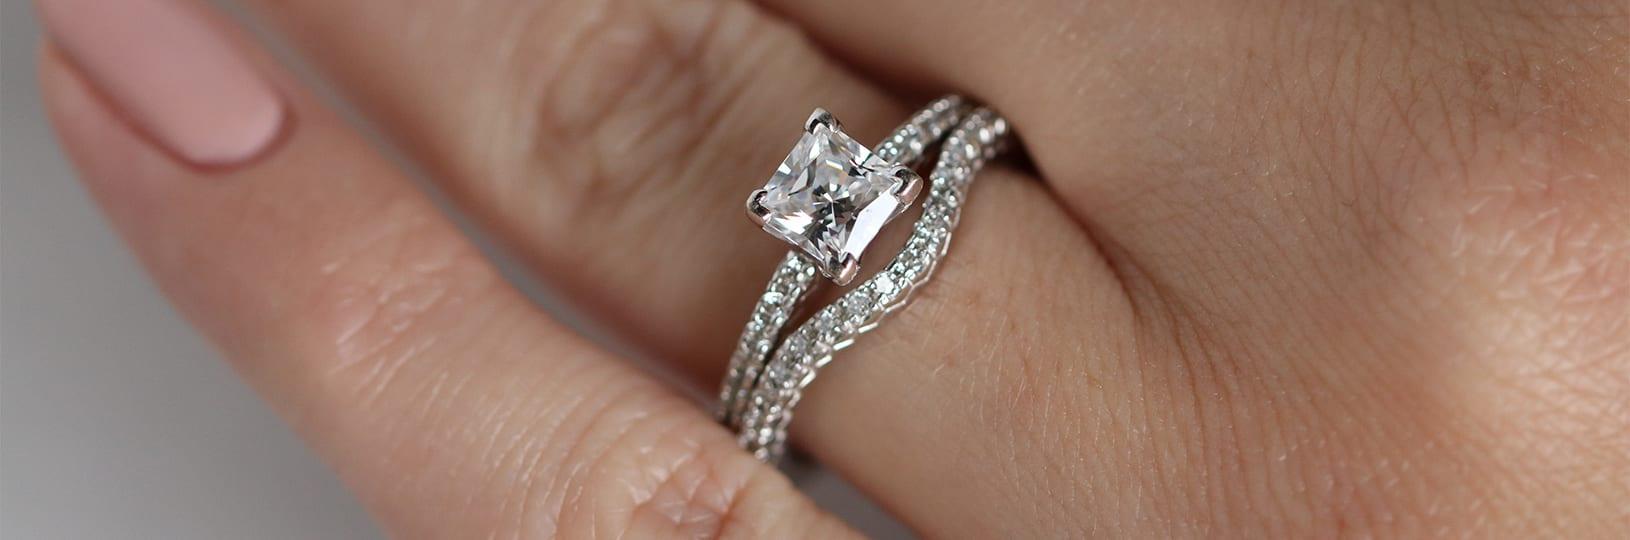 Simulated diamond wedding ring set